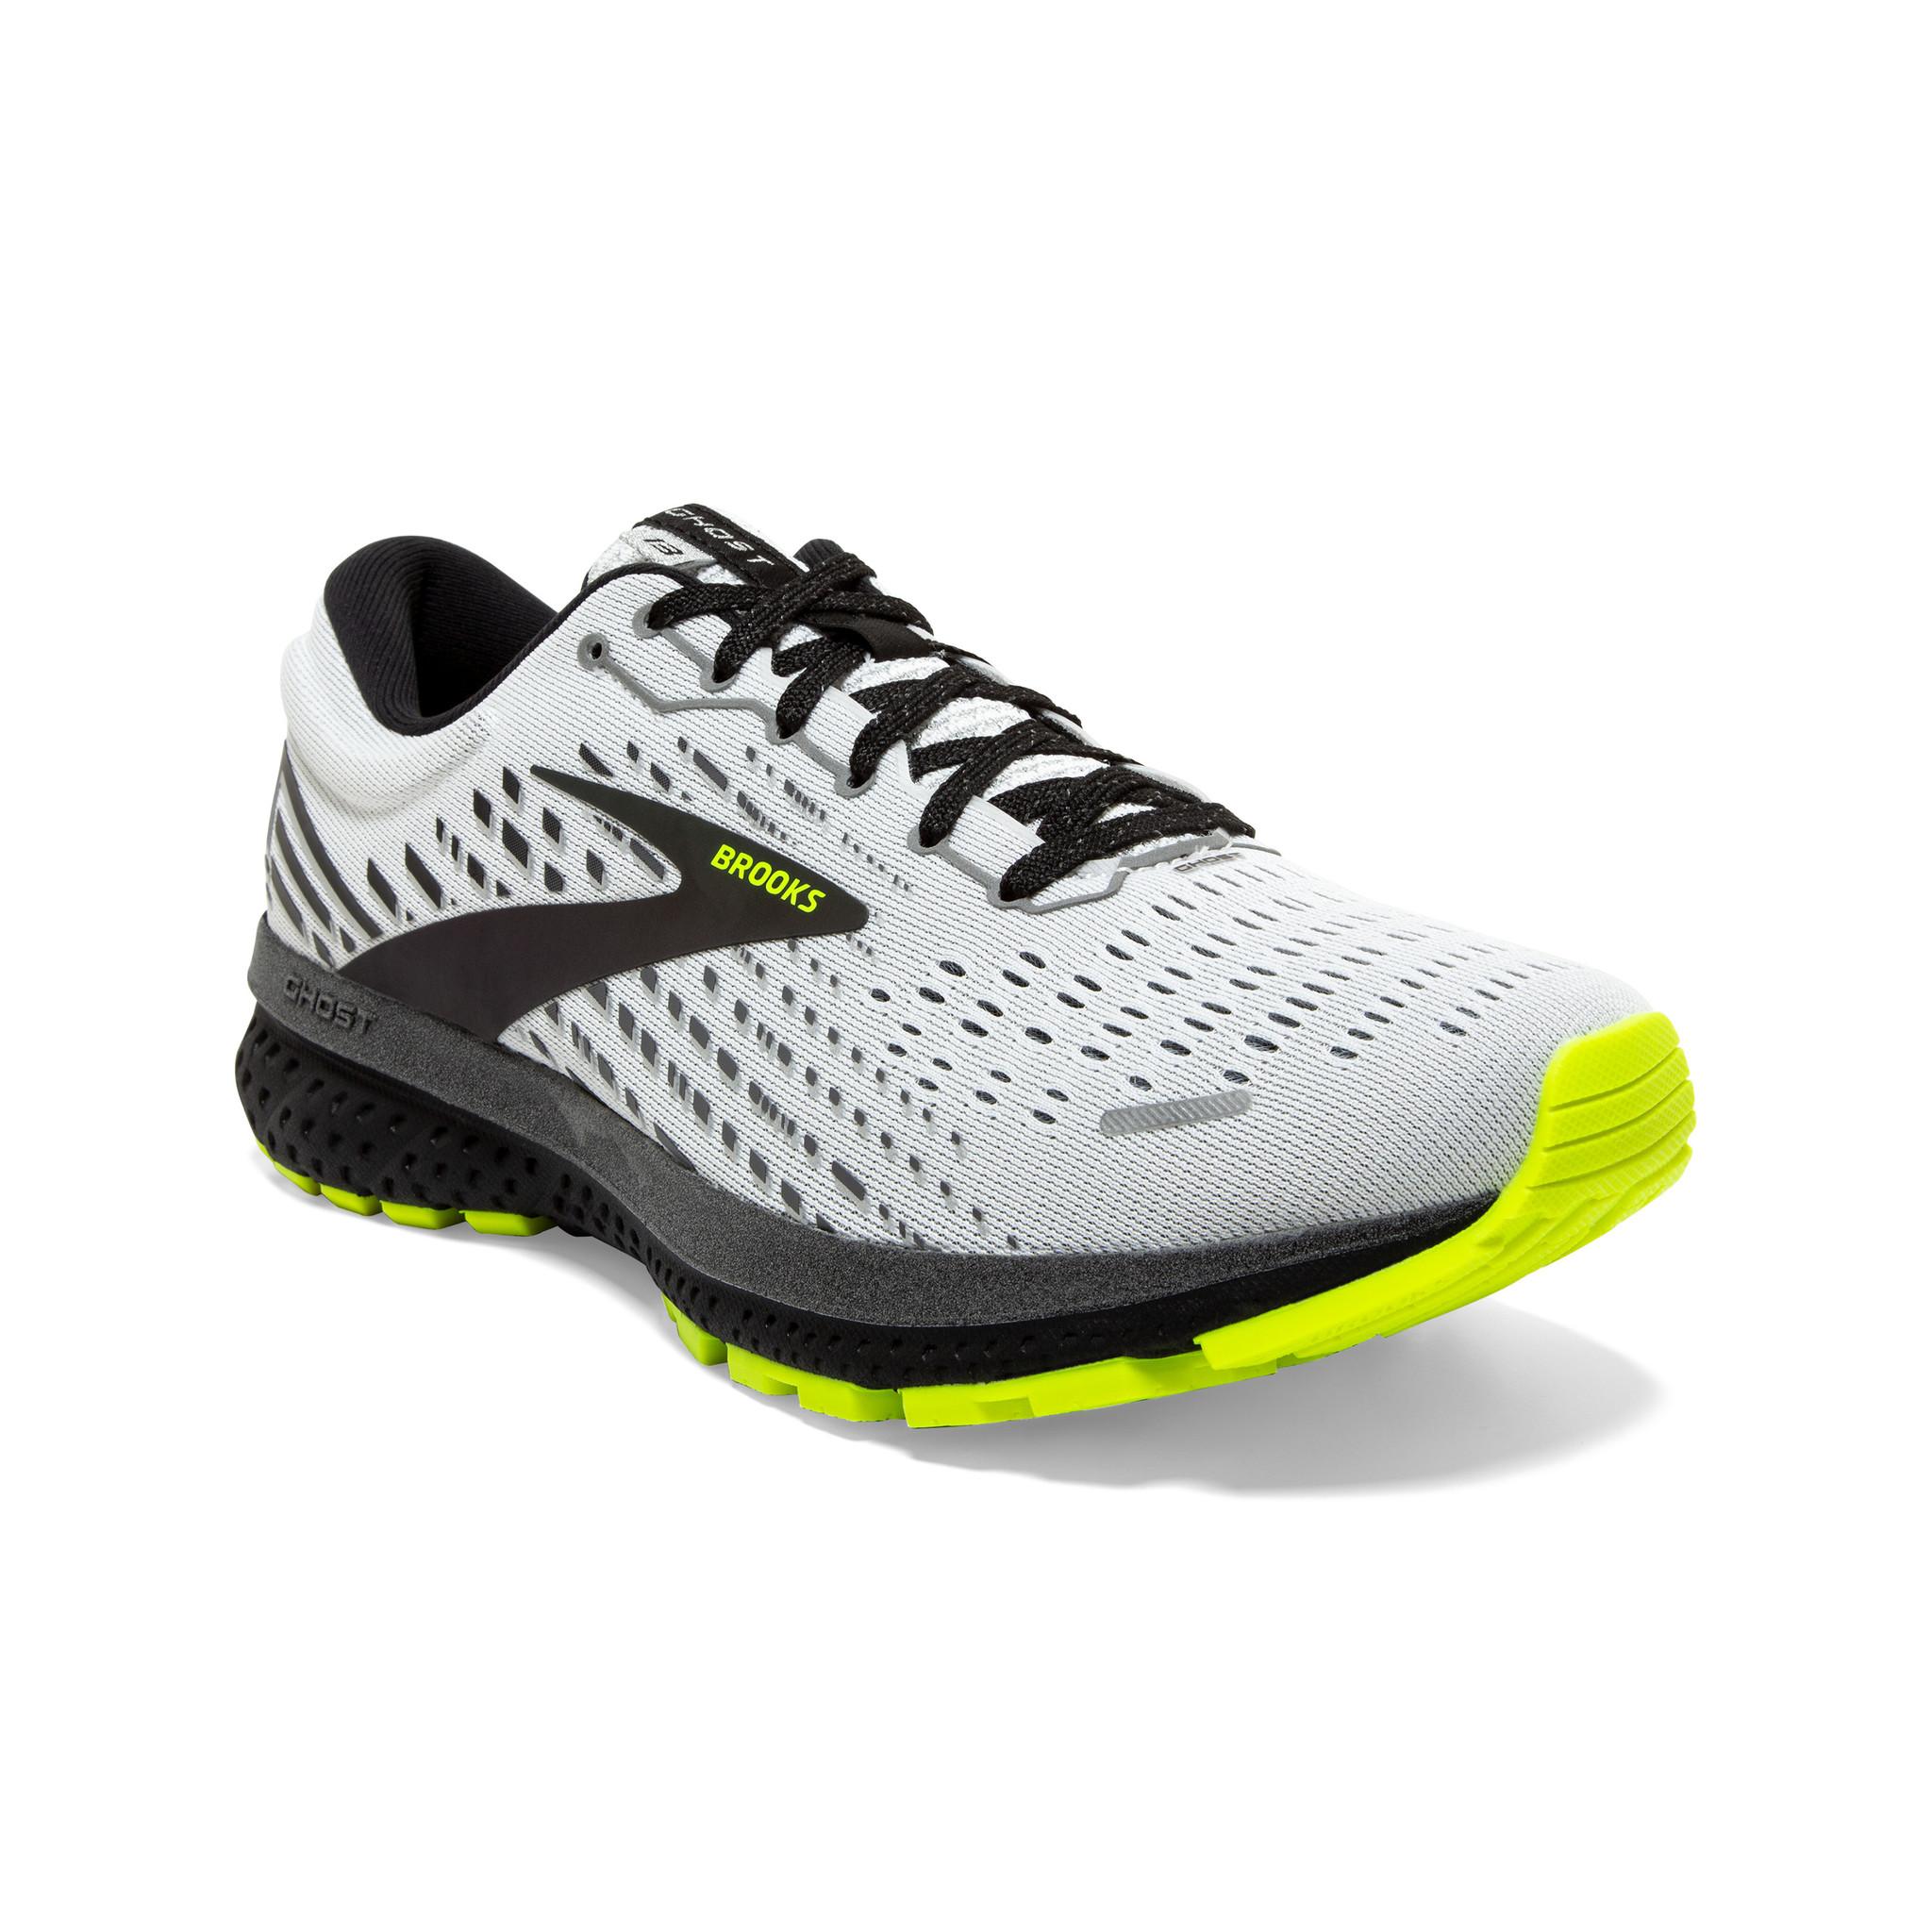 Brooks Brooks Ghost 13 Run Visible - Women Size 10.5